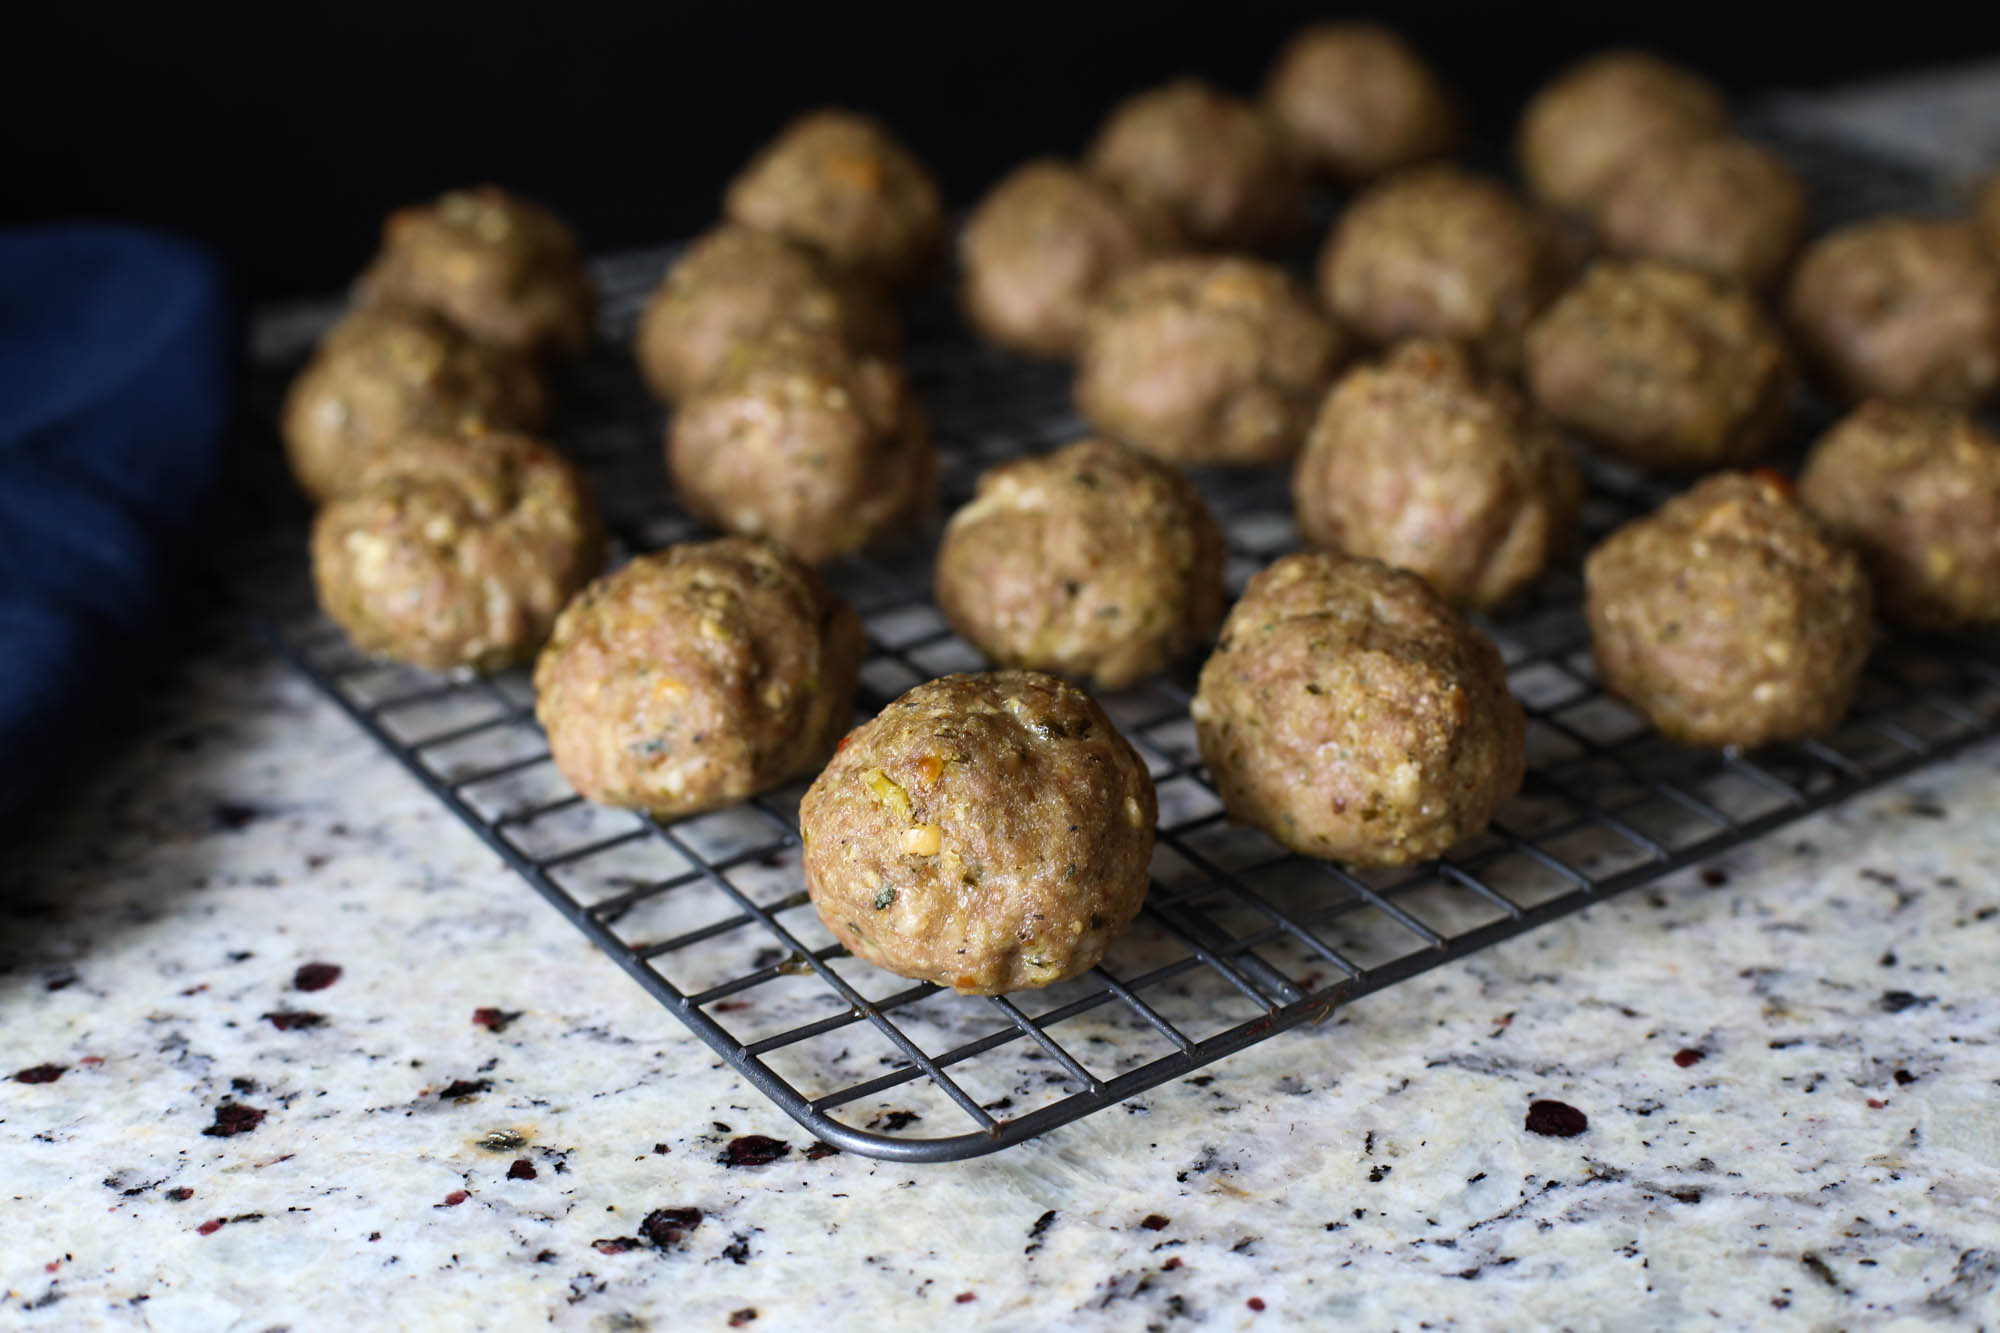 Baked Pesto Meatballs